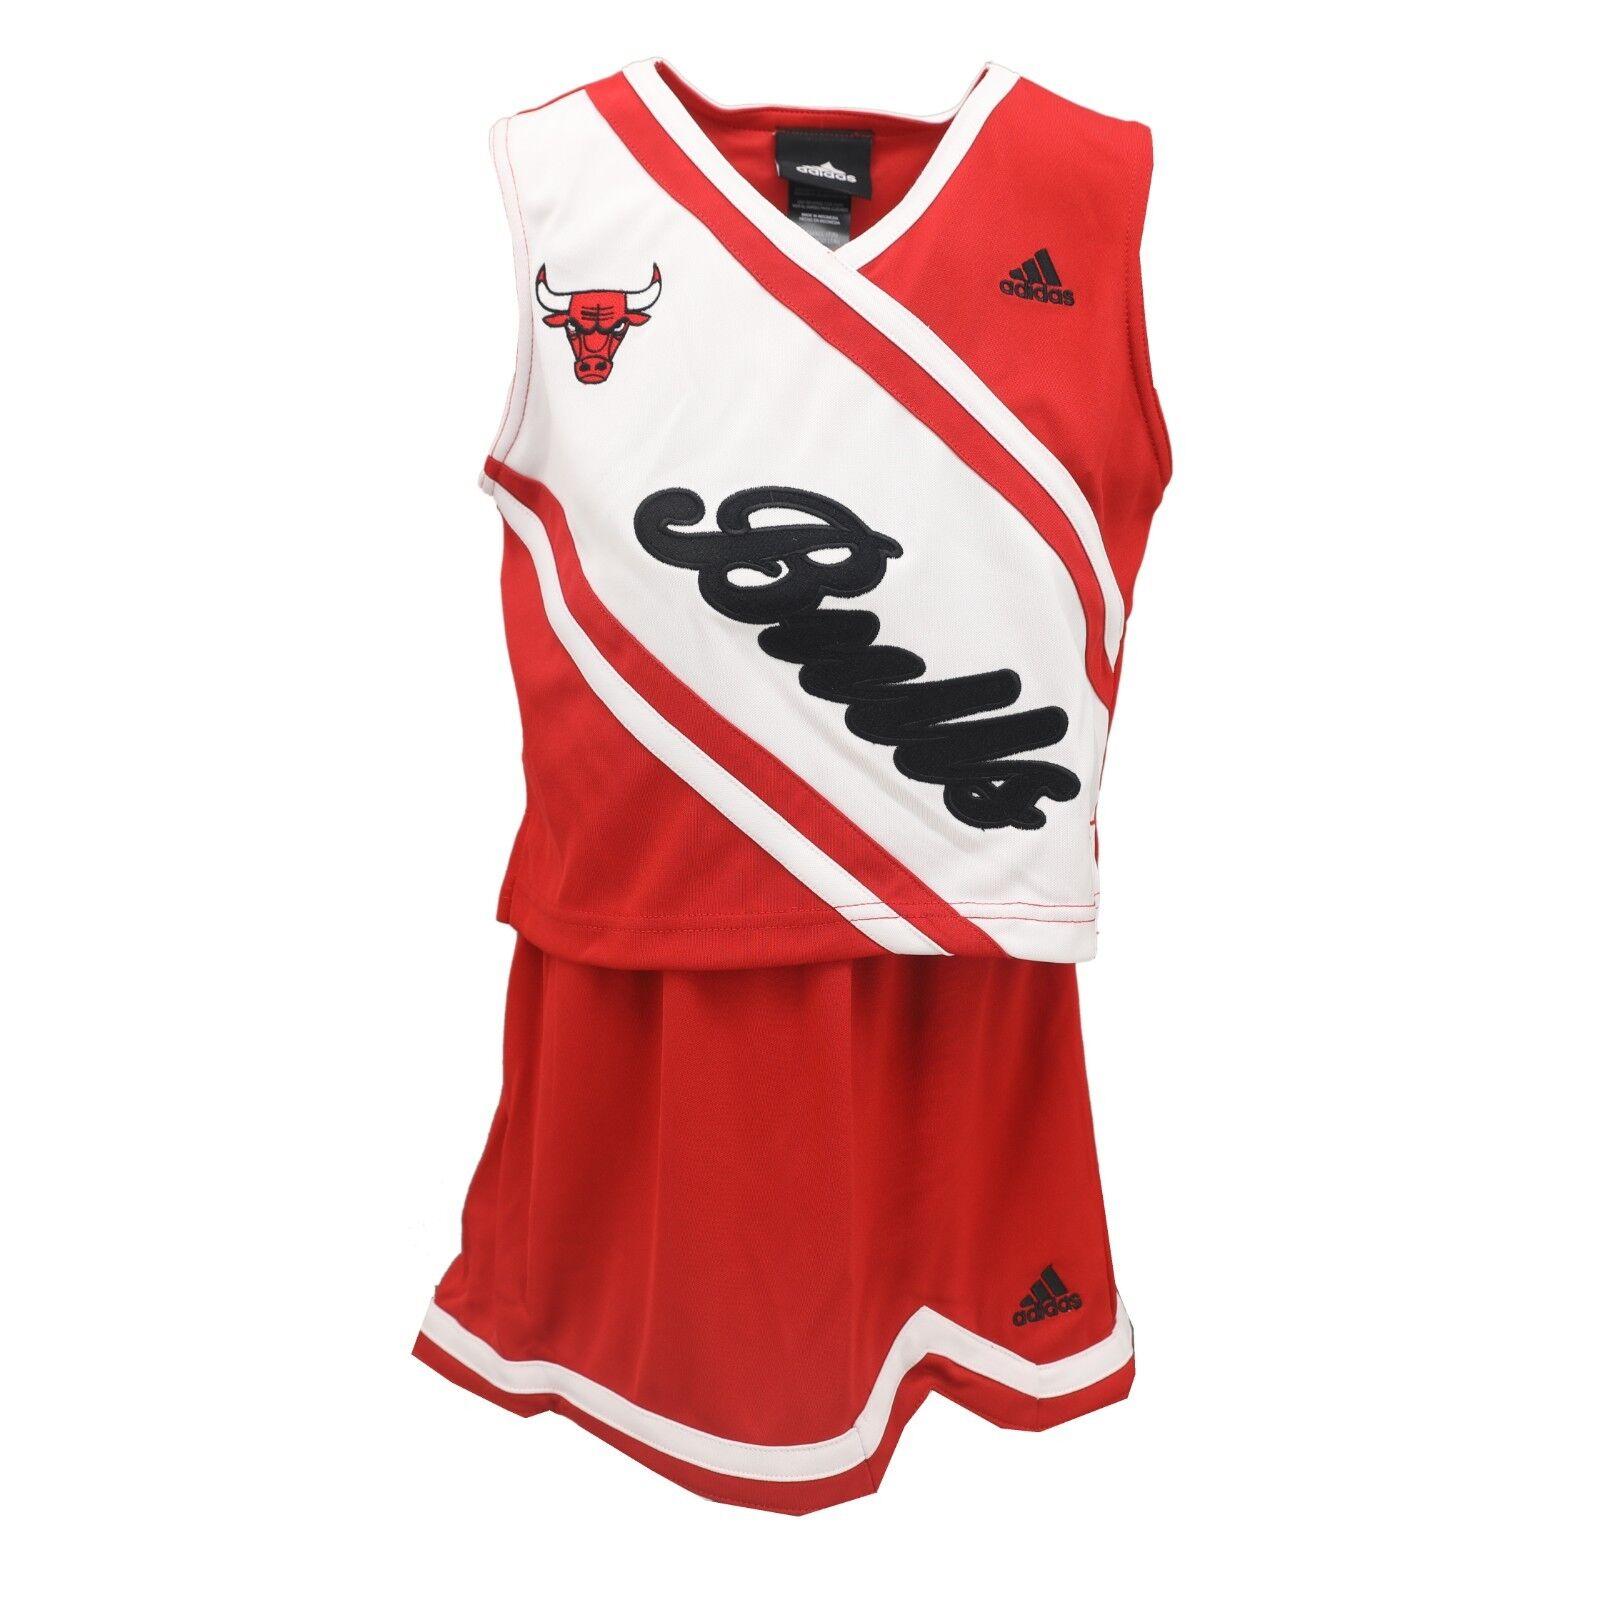 35de15a060e Chicago Bulls NBA Adidas Kids Youth Girls Size 2 Piece Cheerleader Outfit  New